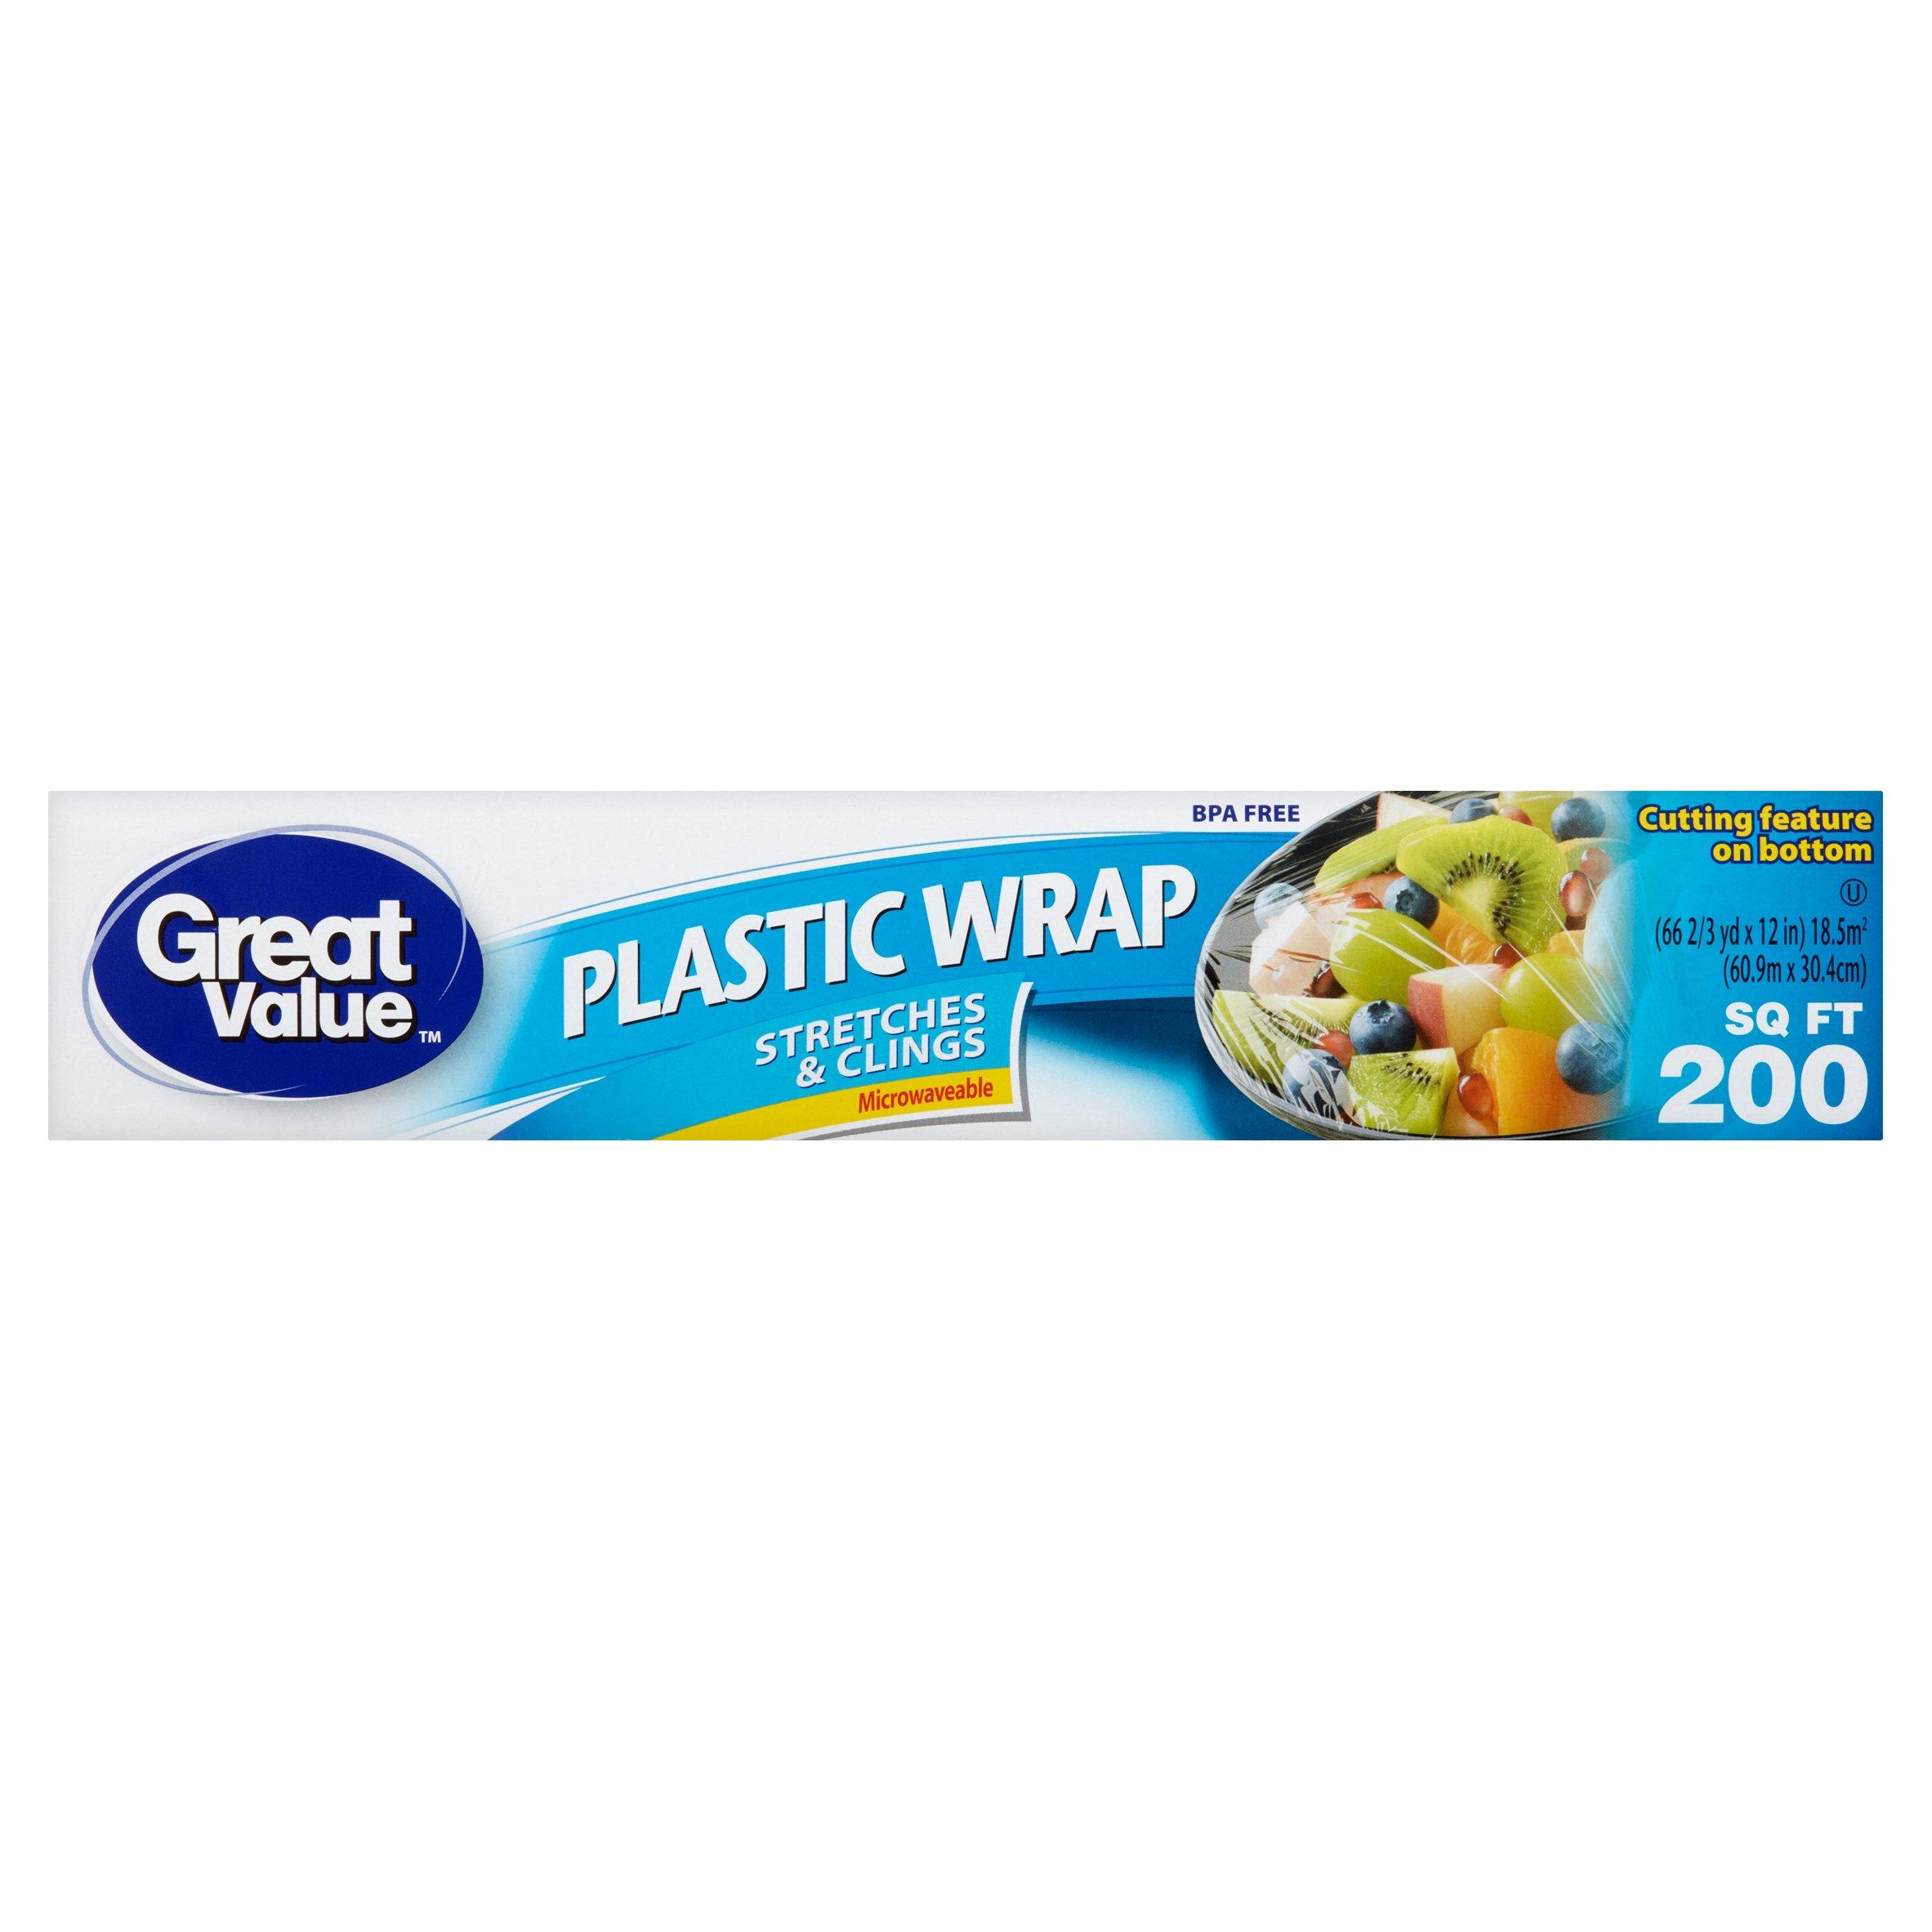 Great Value Plastic Wrap, 200 sq ft